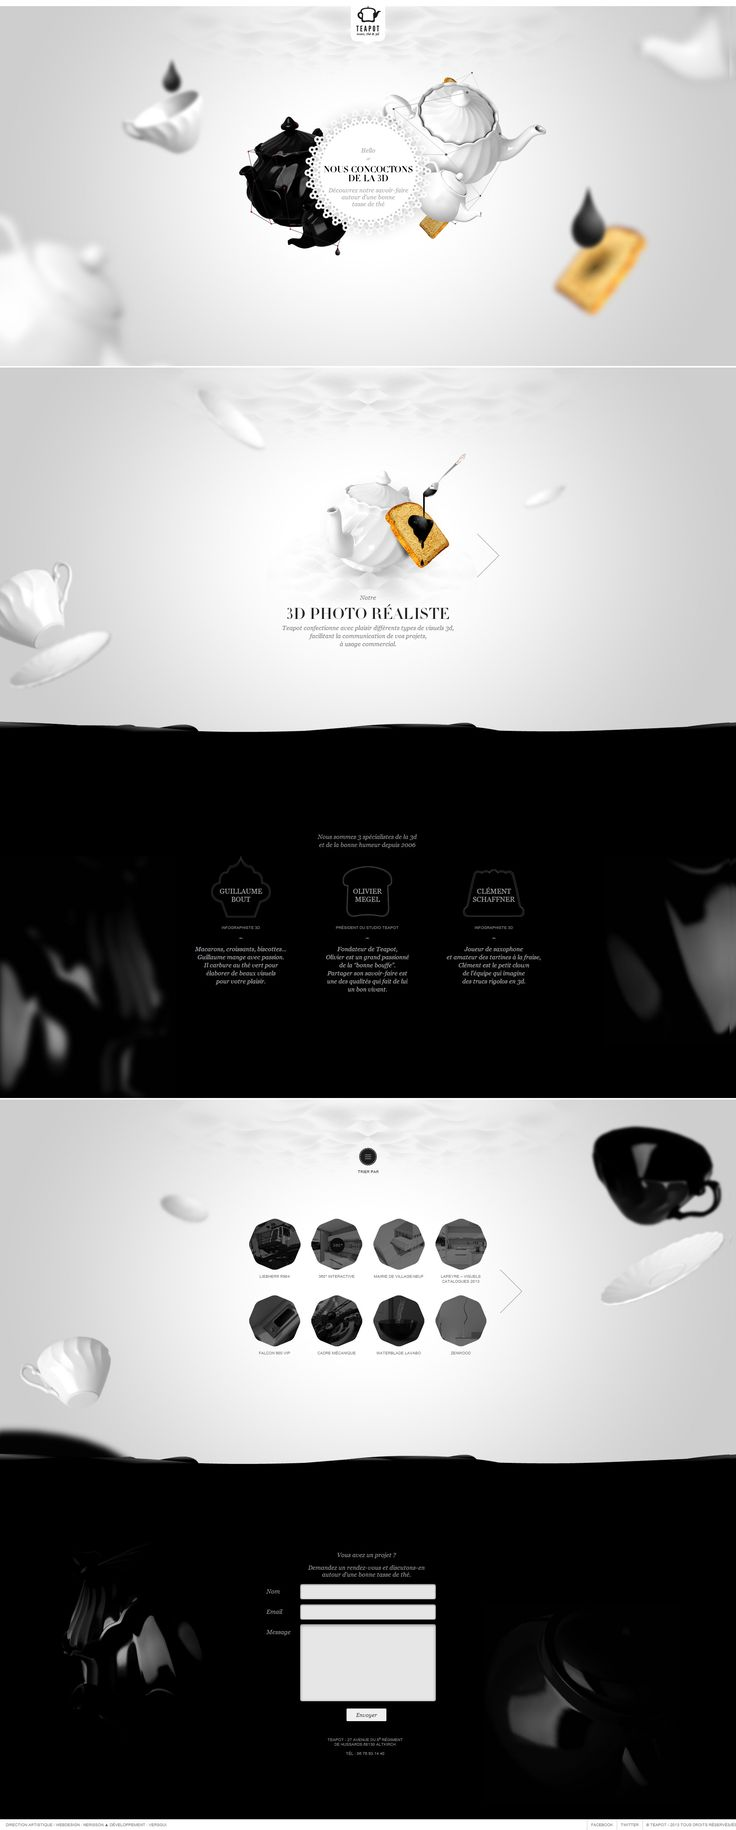 http://www.teapot-creation.com/#/page/home | #webdesign #it #web #design #layout #userinterface #website #webdesign < repinned by www.BlickeDeeler.de | Take a look at www.WebsiteDesign-Hamburg.de